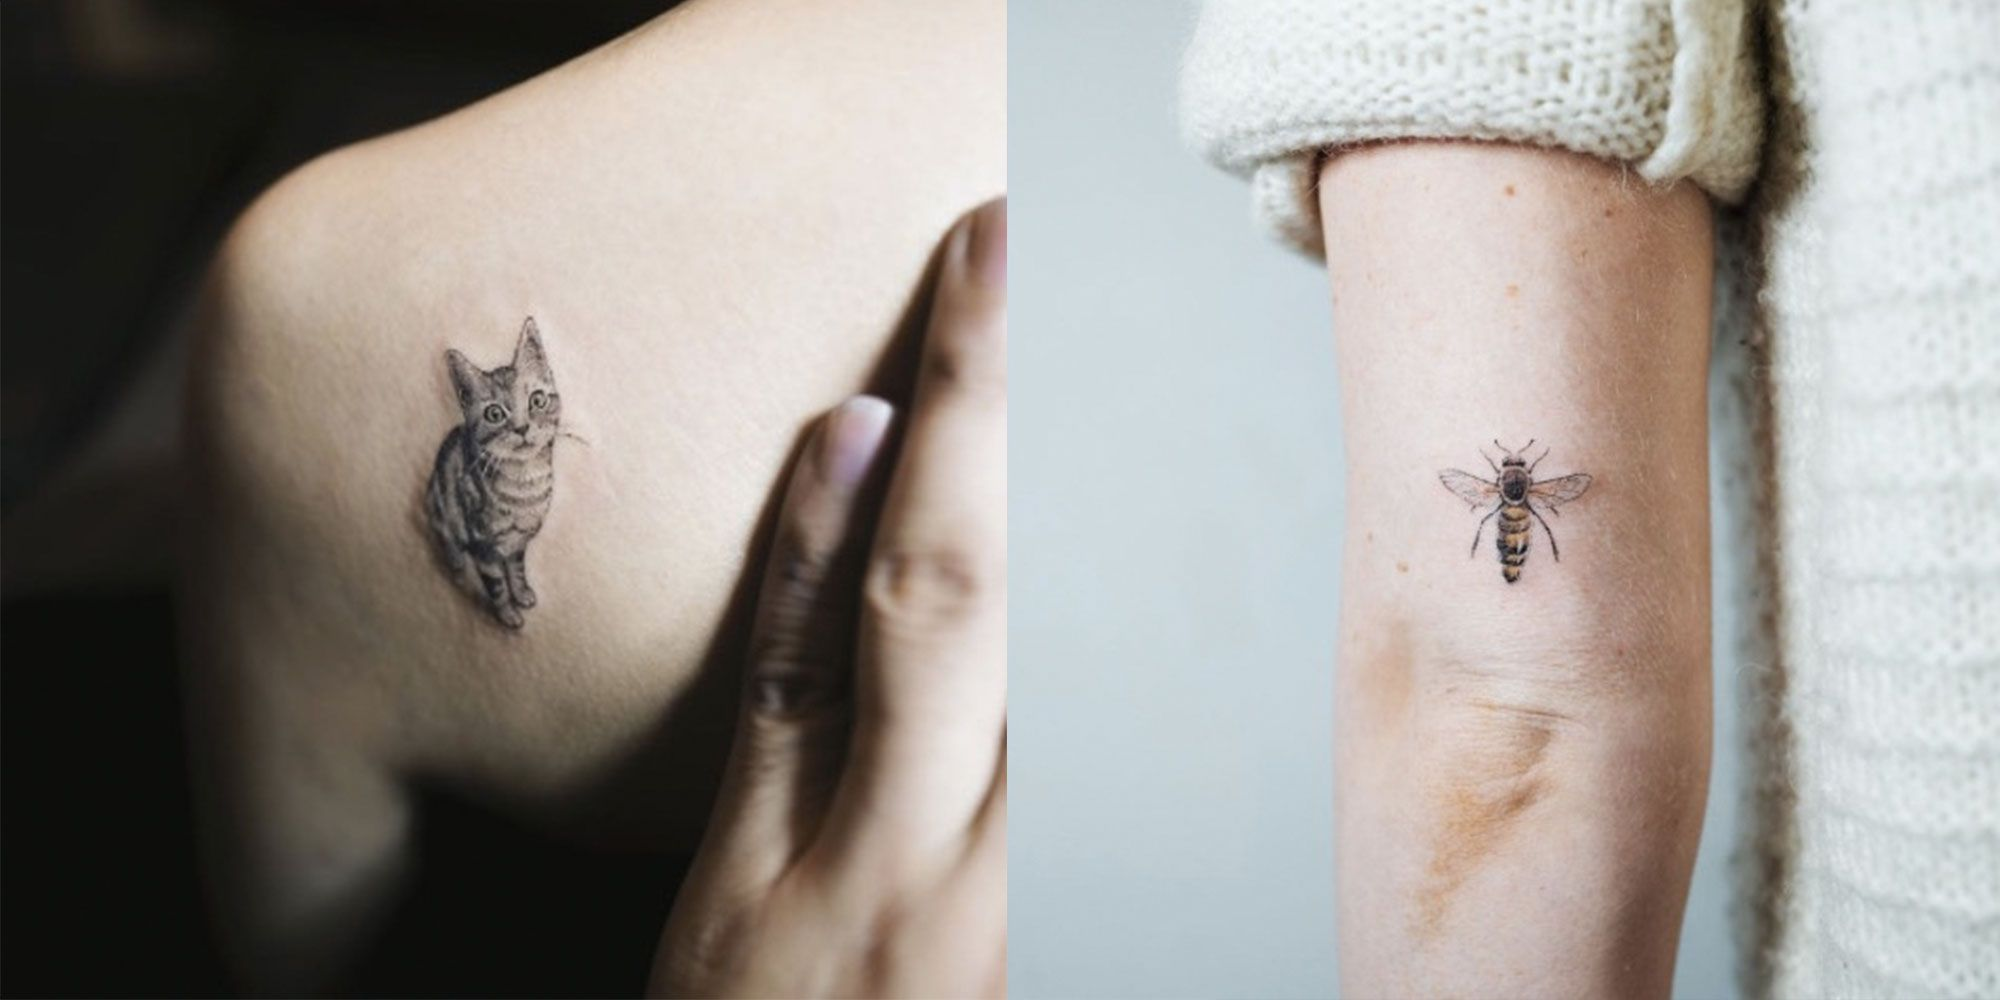 16 tiny animal tattoos delicate animal tattoos for inspiration jeuxipadfo Choice Image